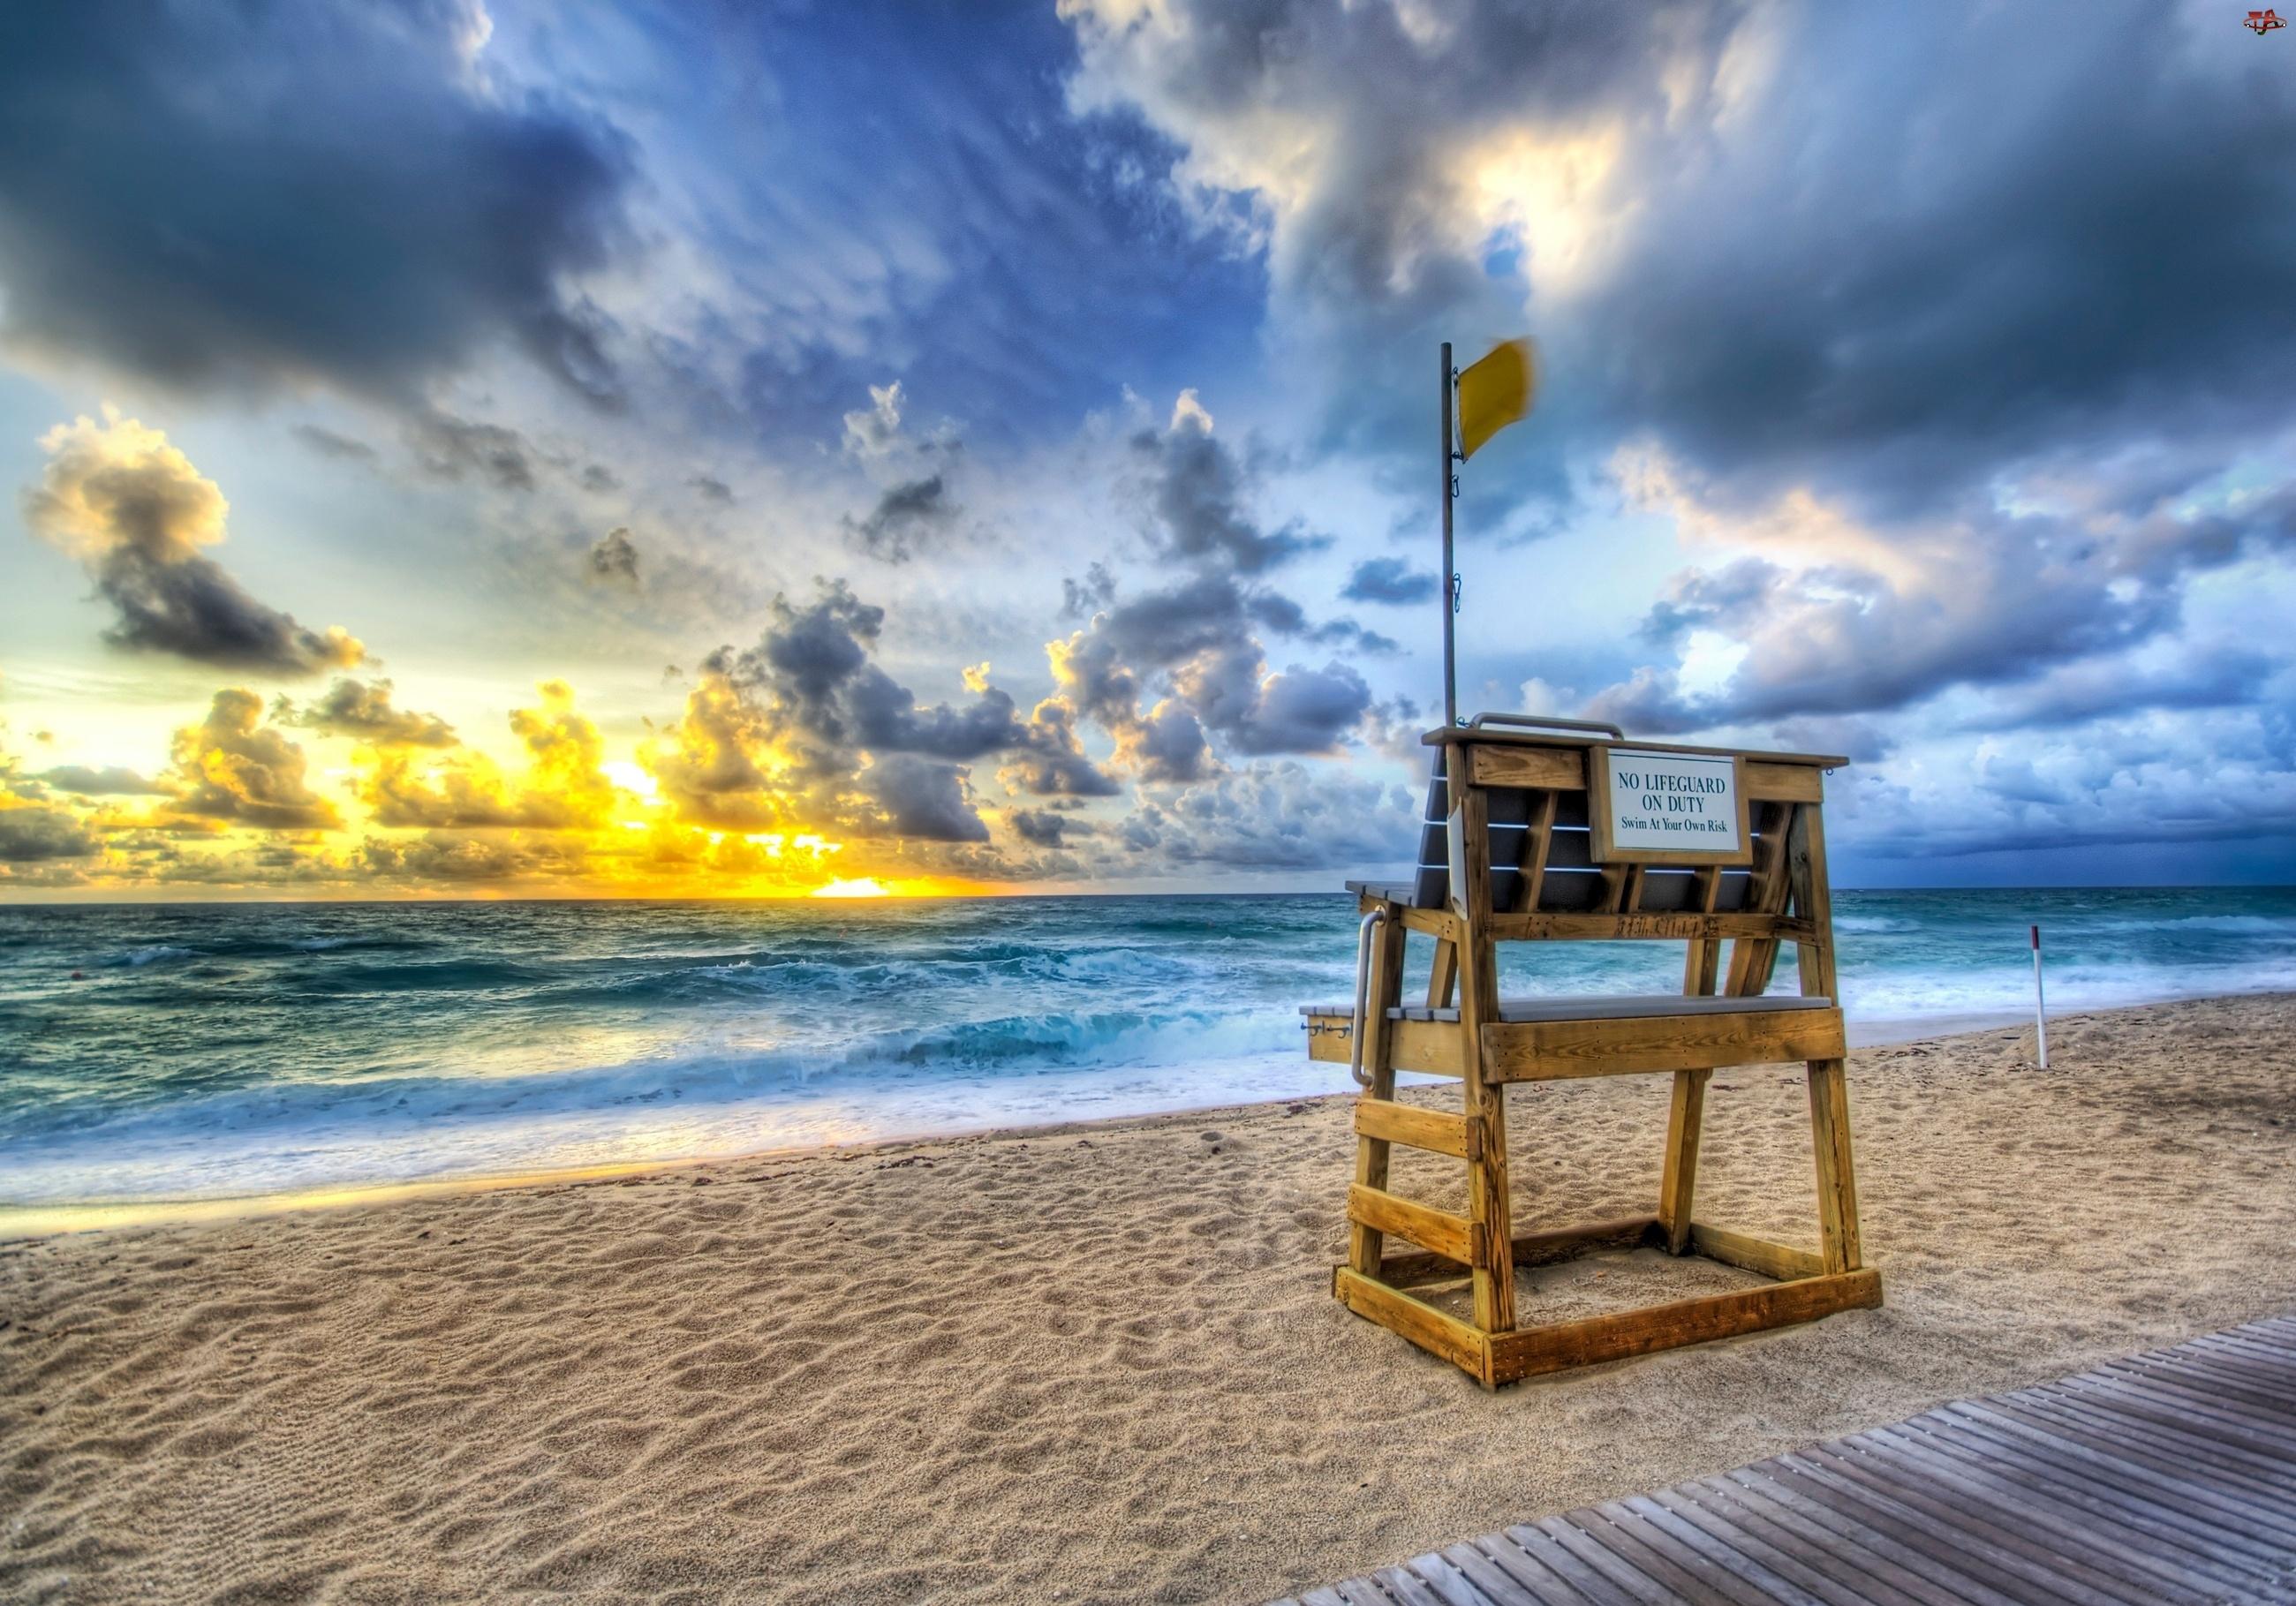 USA, Plaża, Palm Beach, Ocean, Floryda